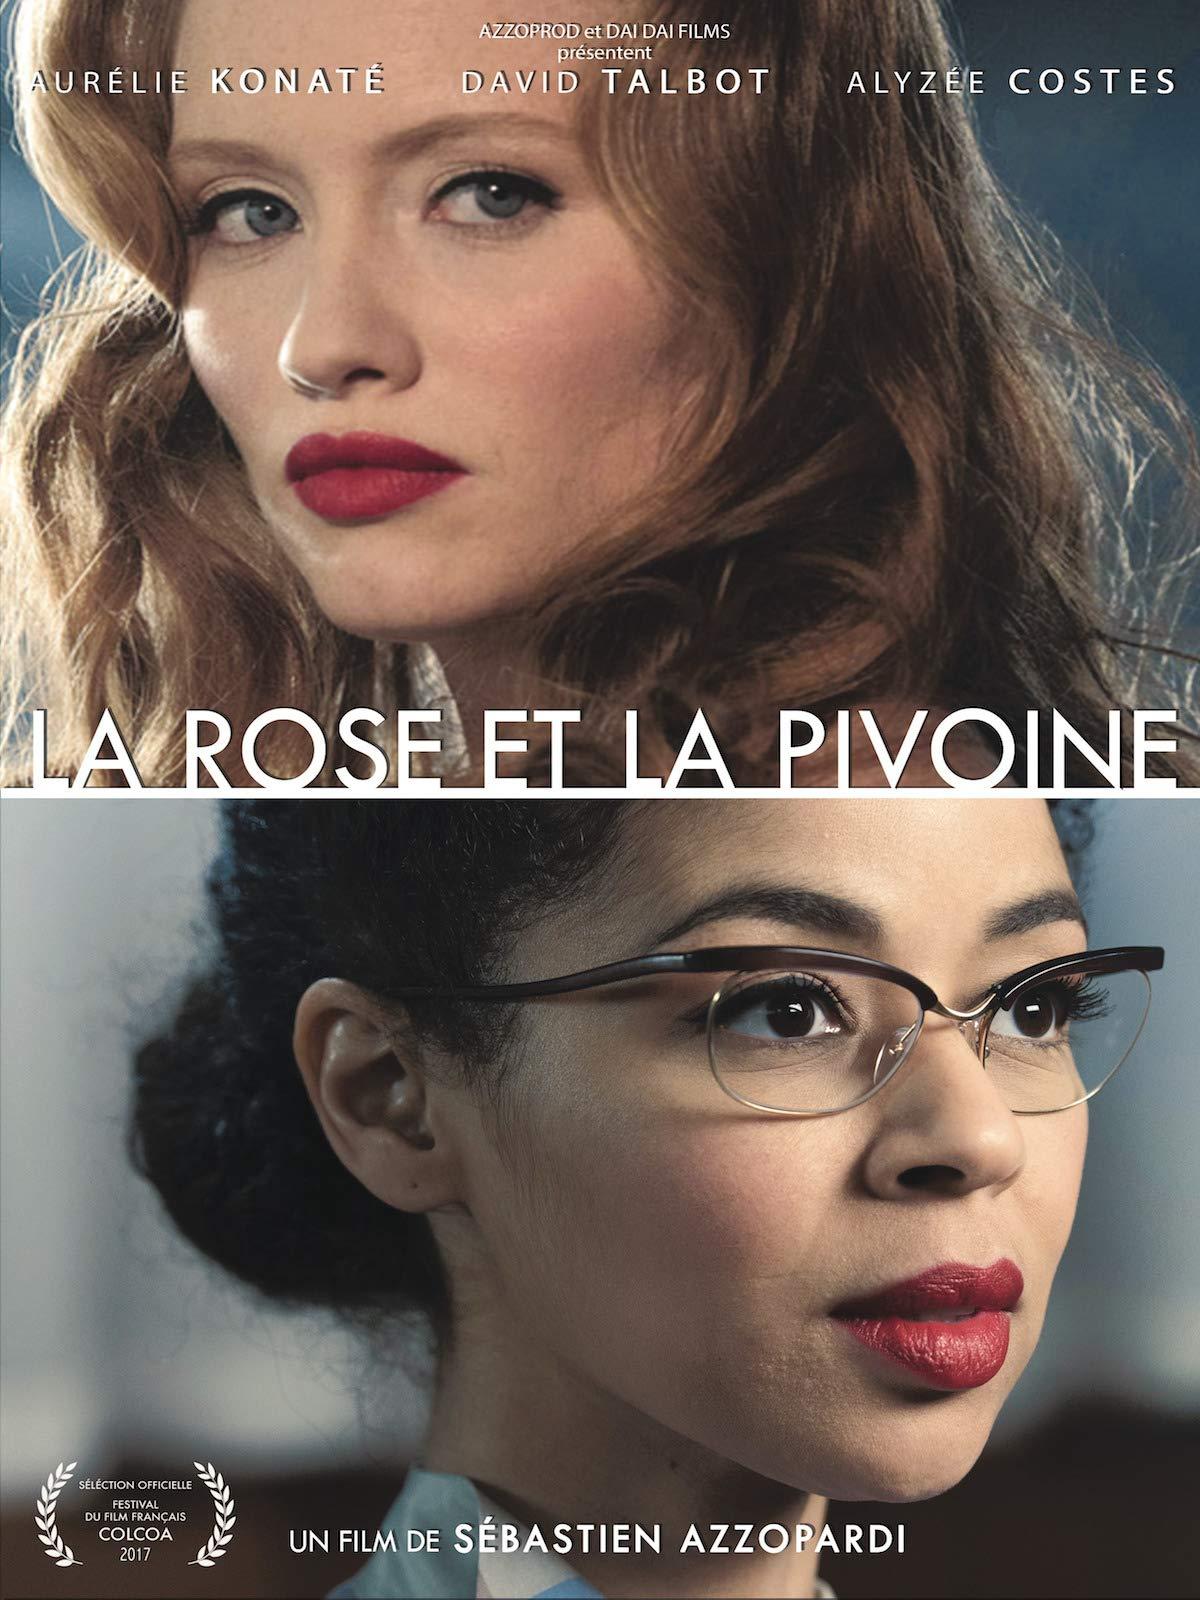 Rose & Peony, A War of Flowers (La Rose et la Pivoine)